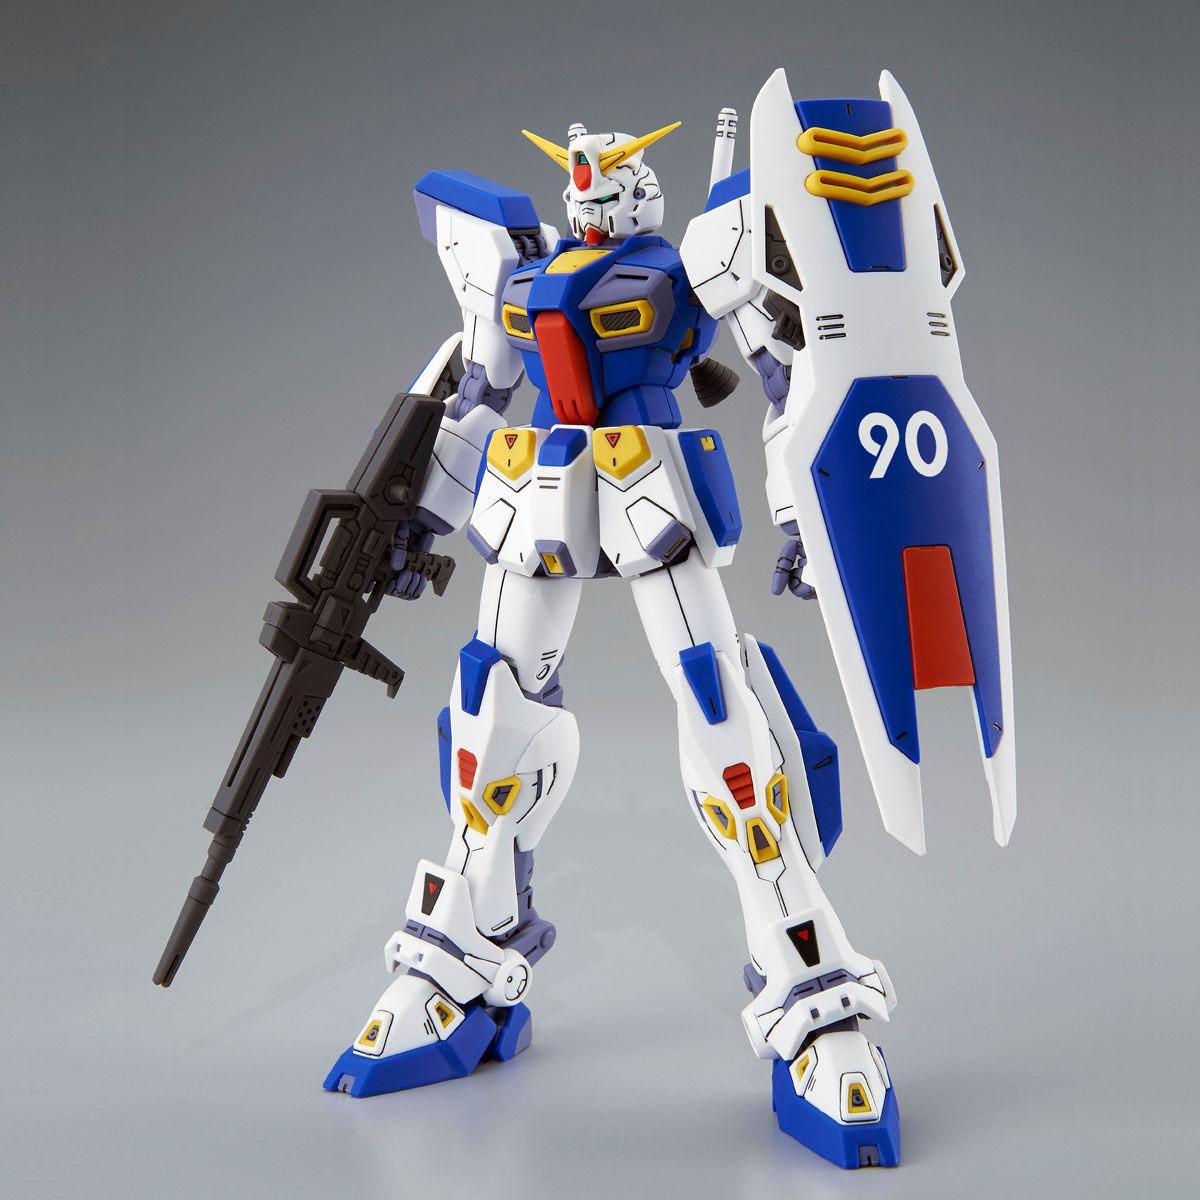 MG 1/100『ガンダムF90』プラモデル-002